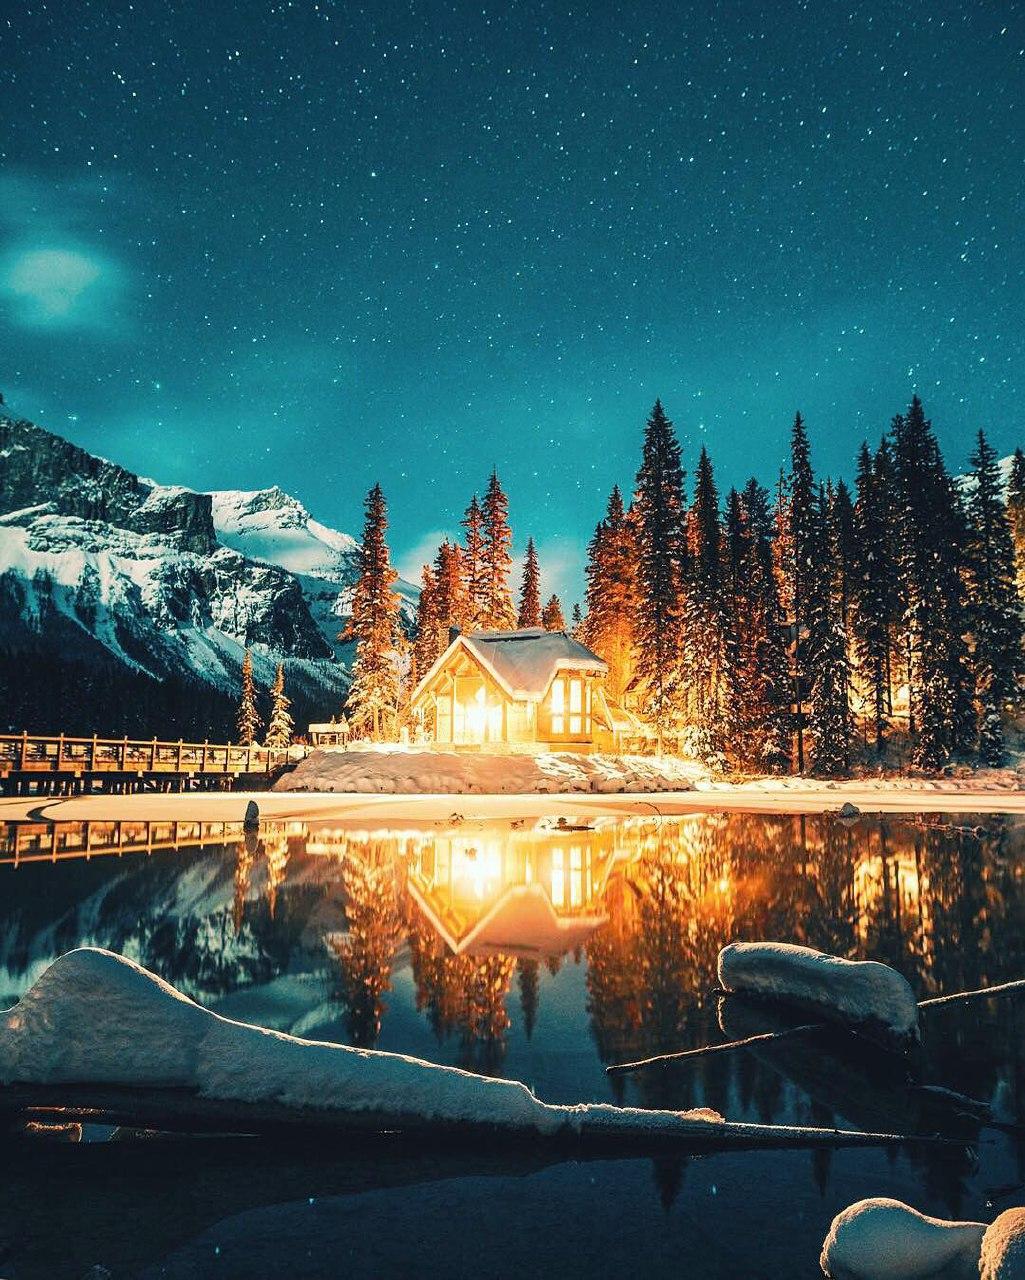 عکس فوق العاد زیبا و رویایی کلبه کنار آب و آسمان پرستاره شب